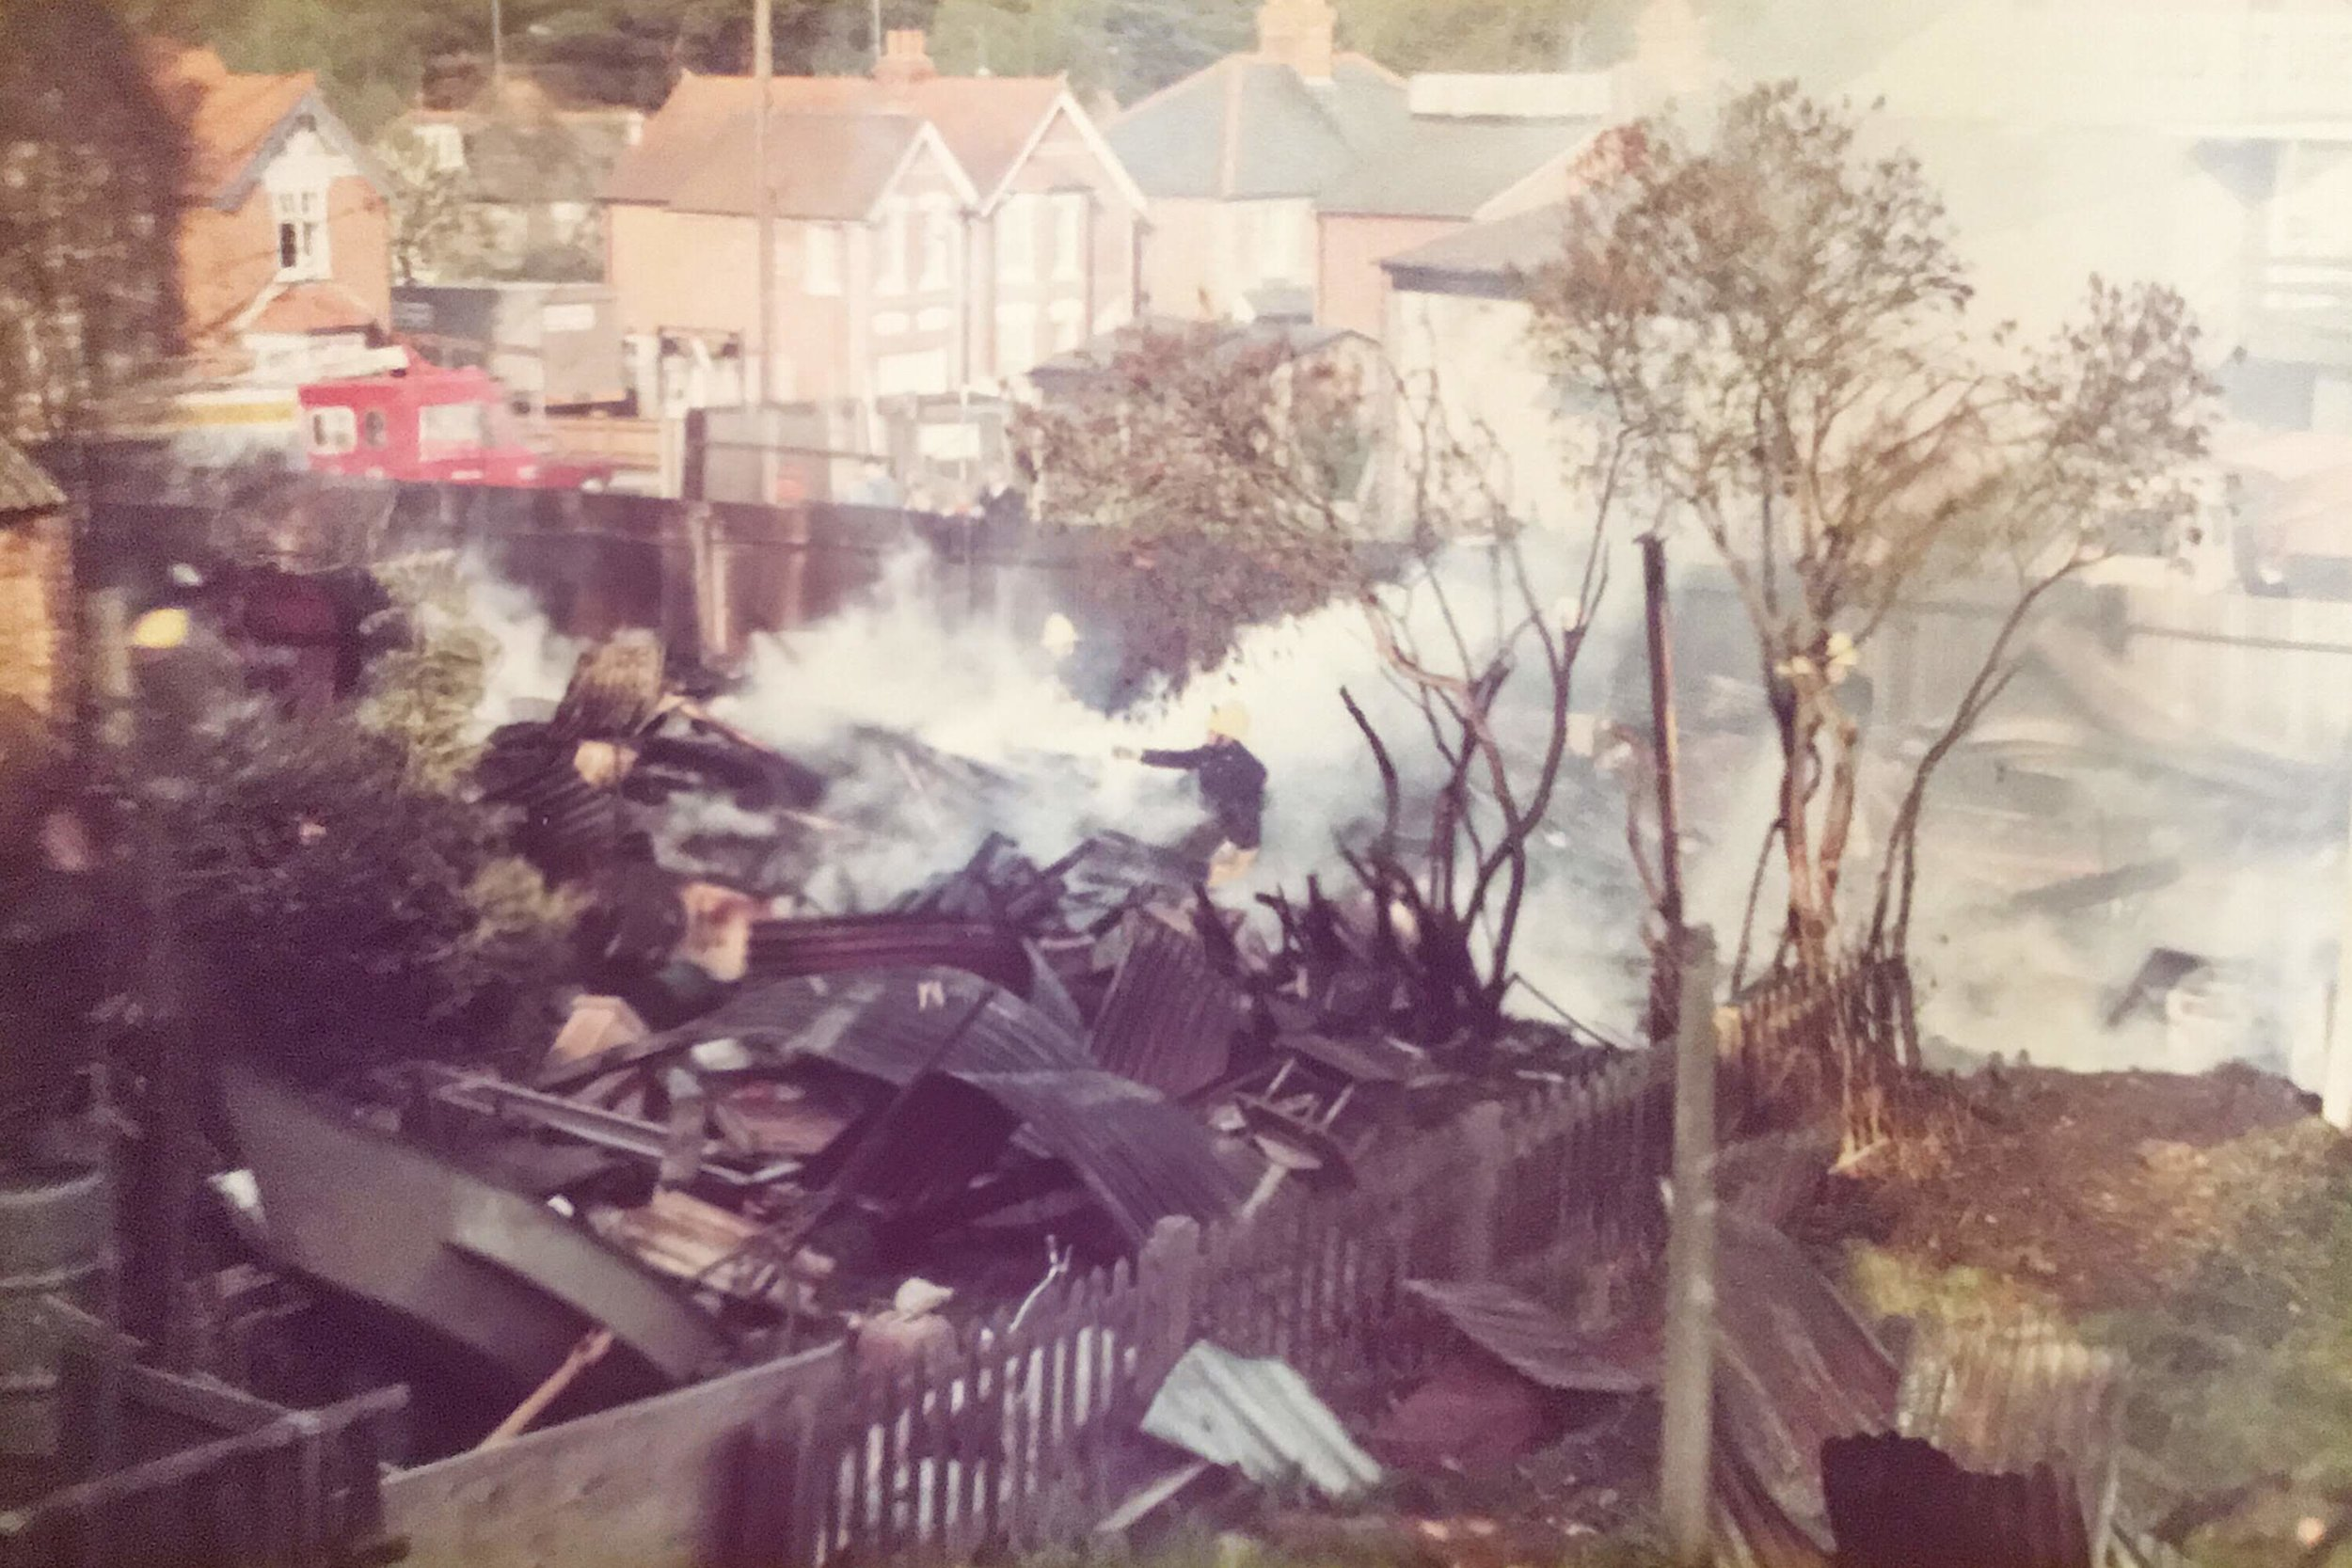 Destruction of the old yard